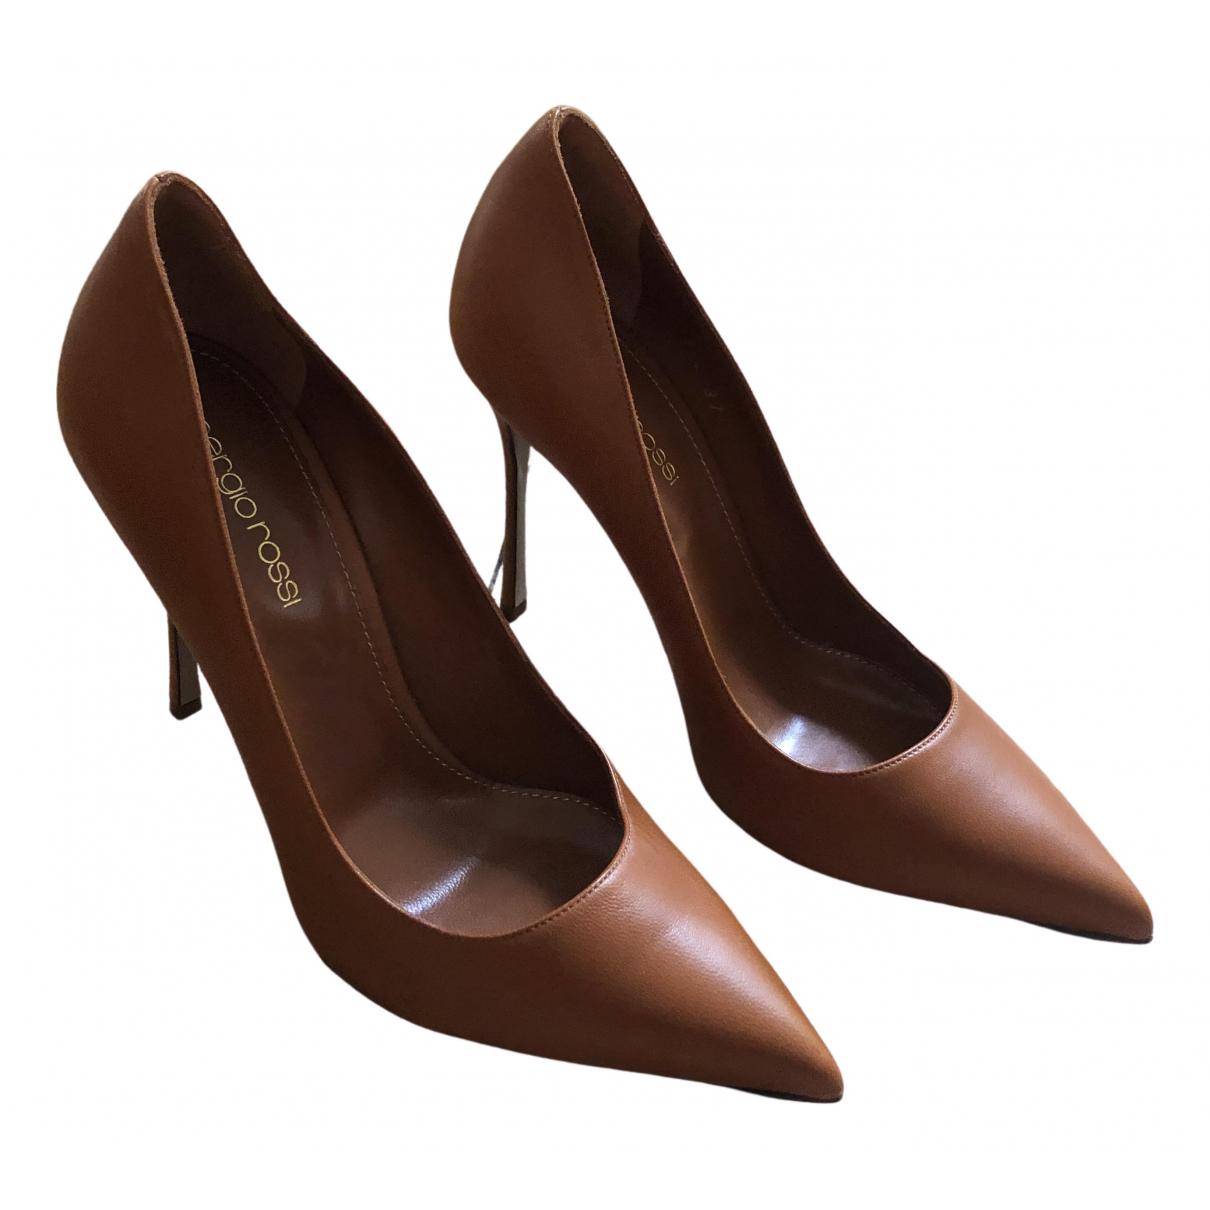 Sergio Rossi \N Camel Leather Heels for Women 37 EU